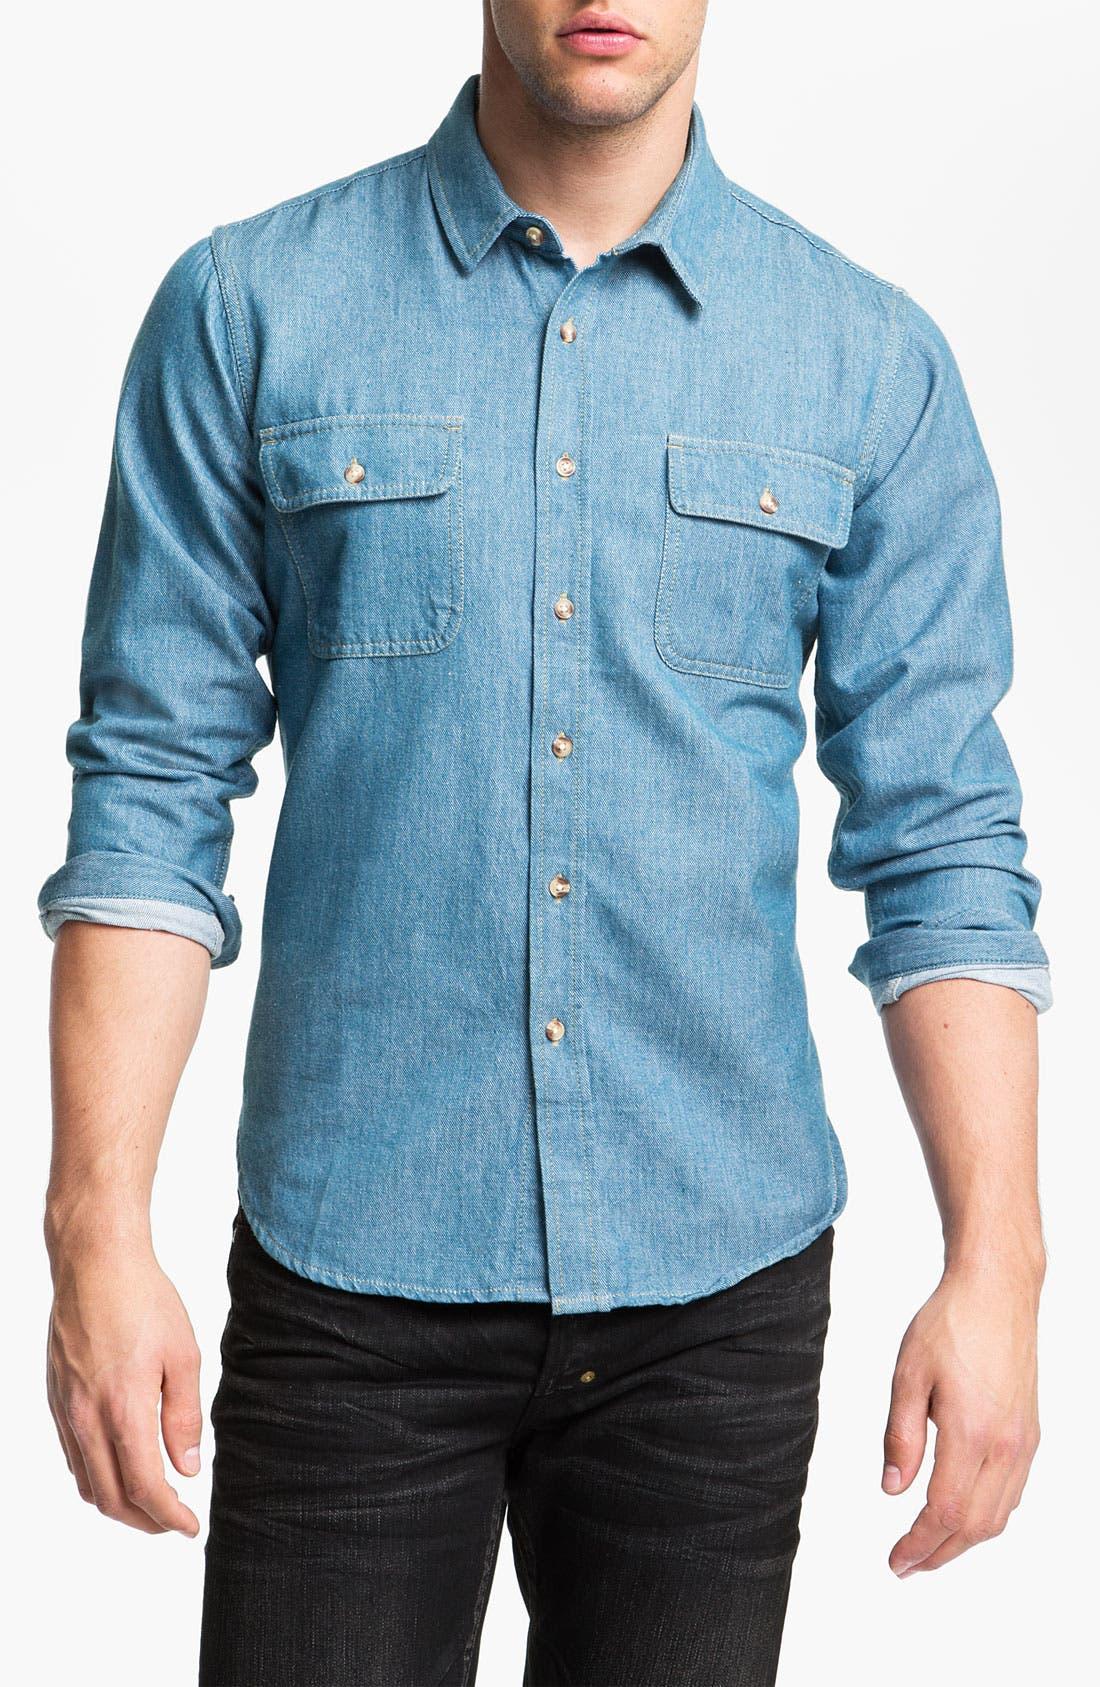 Main Image - Pendleton Coat, Obey Shirt & PRPS Slim Fit Jeans